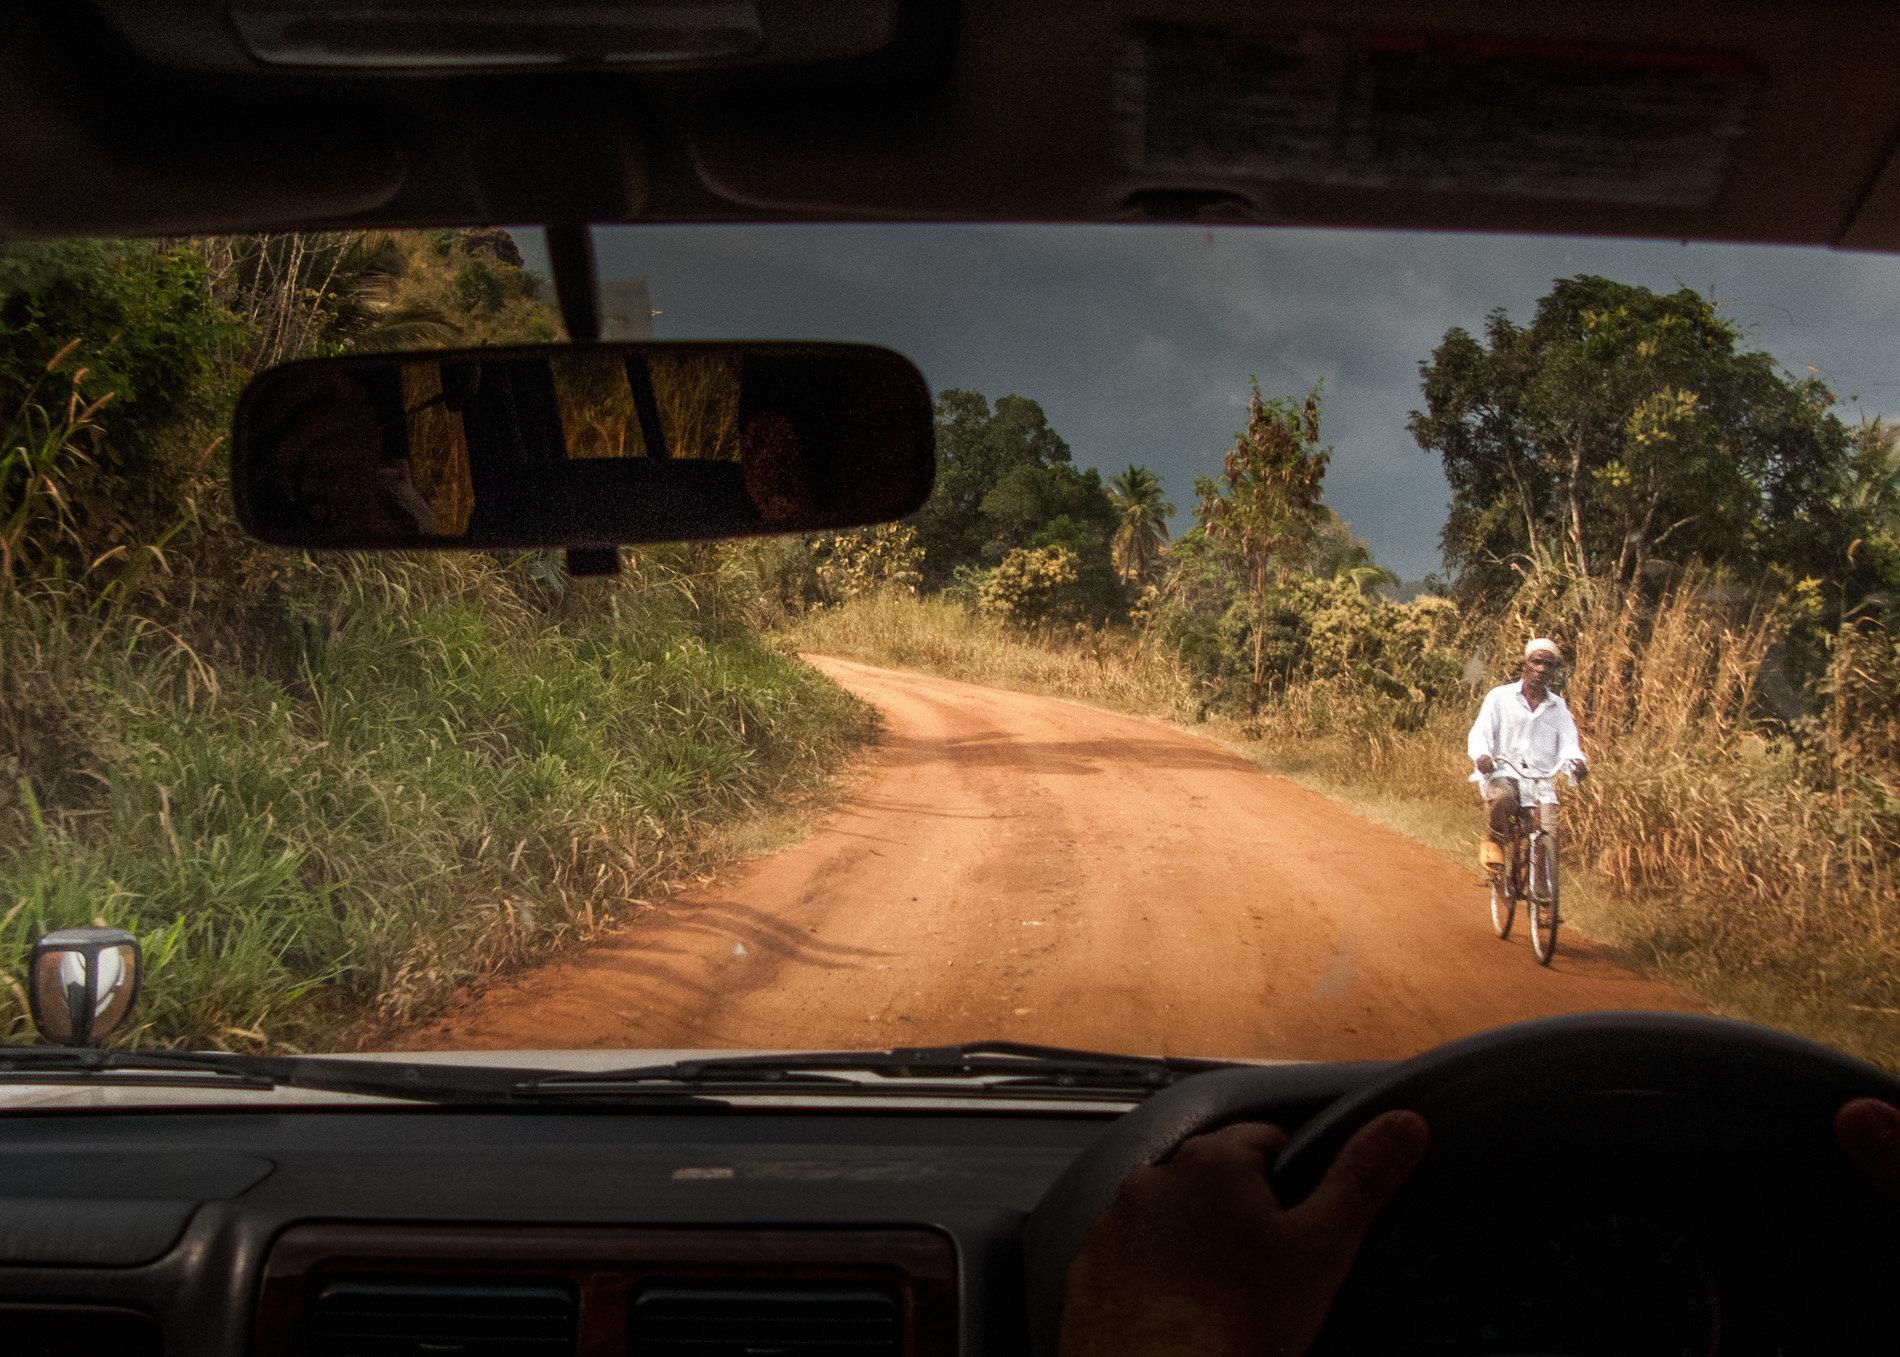 Tanzania,_Back_Seat_View-1761.jpg